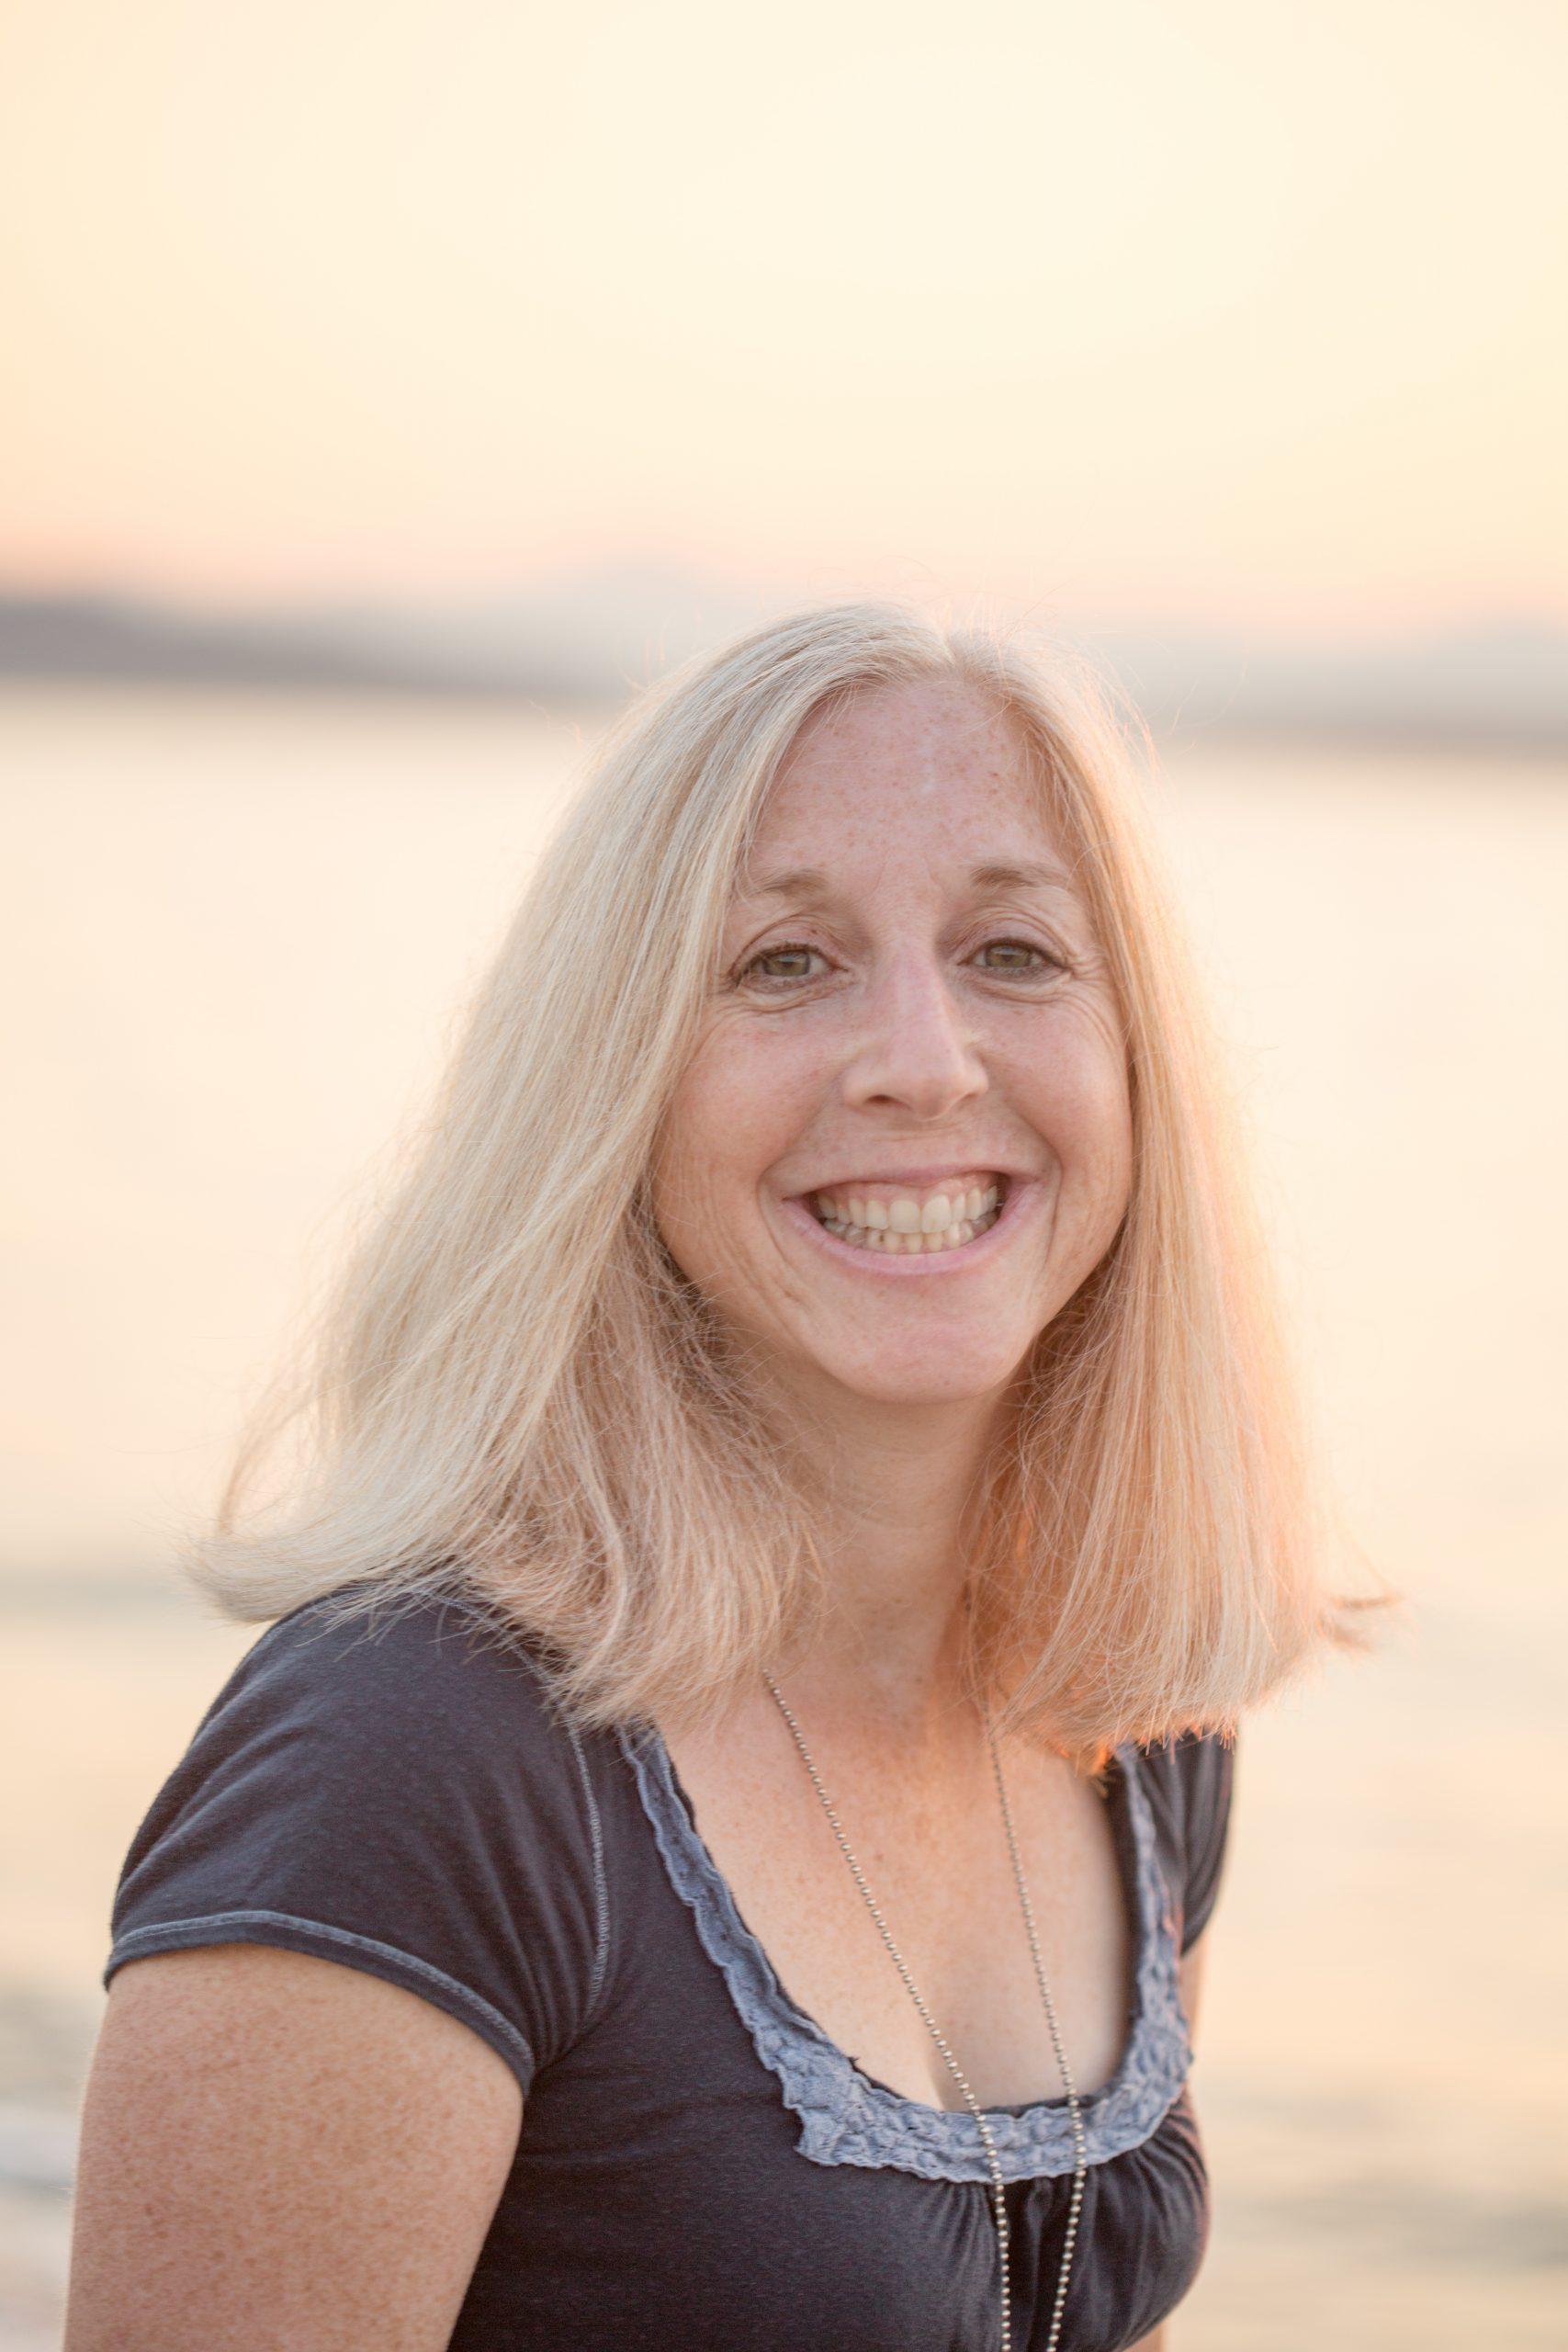 Author Joanne Lewis